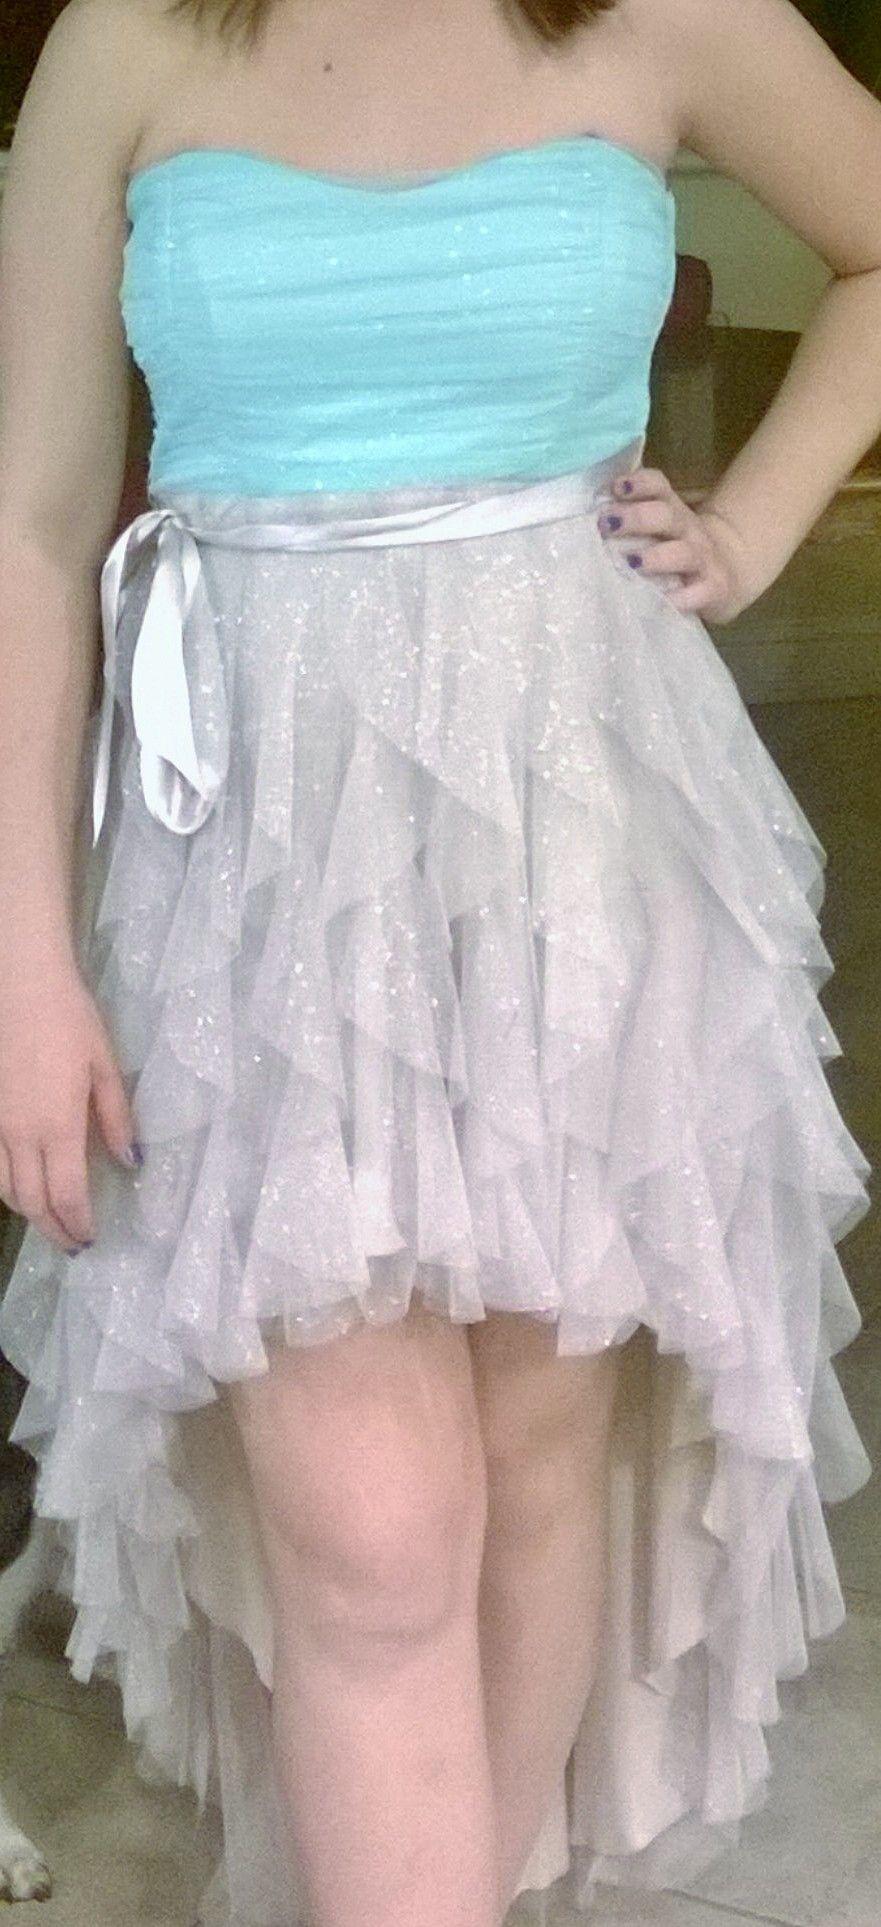 My th grade graduation dress dresses pinterest graduation